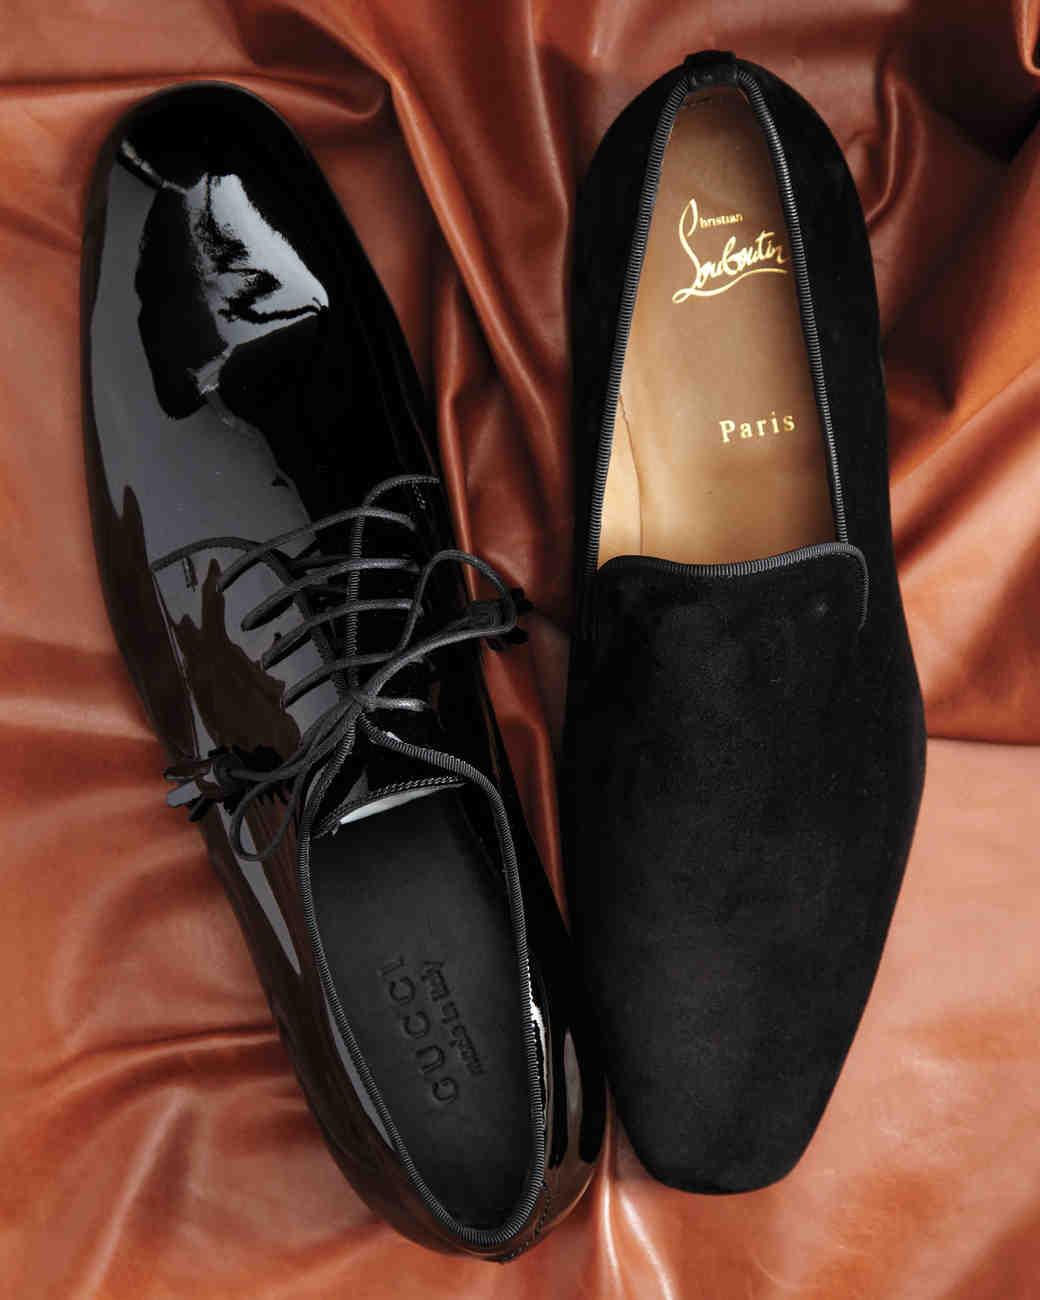 shoes-mmsw108757.jpg